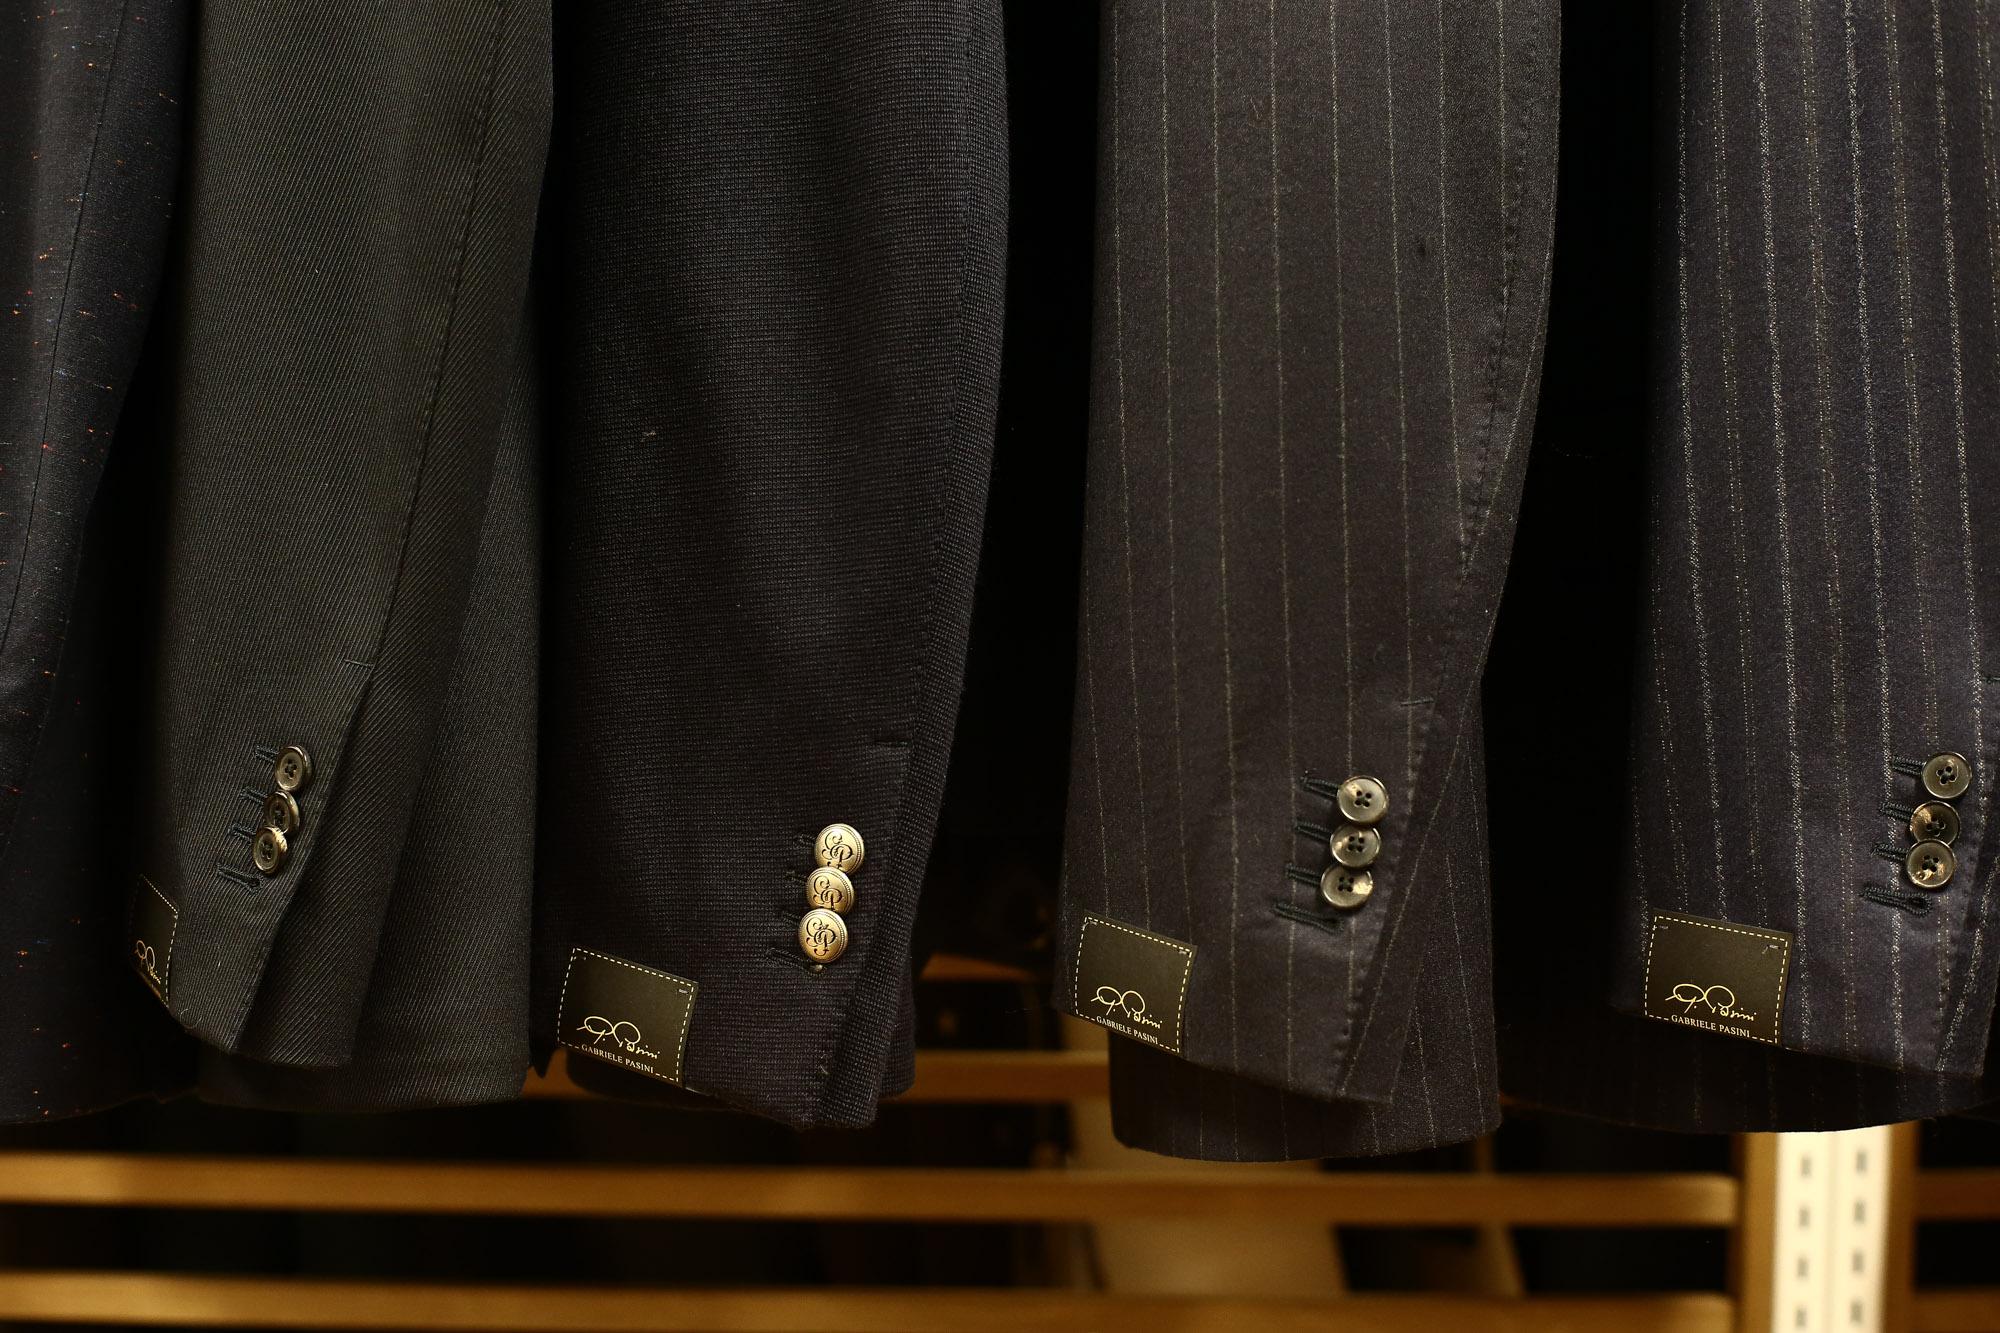 GABRIELE PASINI / ガブリエレ パジーニ (2017 秋冬 メイン 展示会) 愛知 名古屋 ZODIAC ゾディアック スーツ ジャケット セレクトショップ イタリア ストラスブルゴ  STRASBURGO gabrielepasini ガブリエレパジーニ